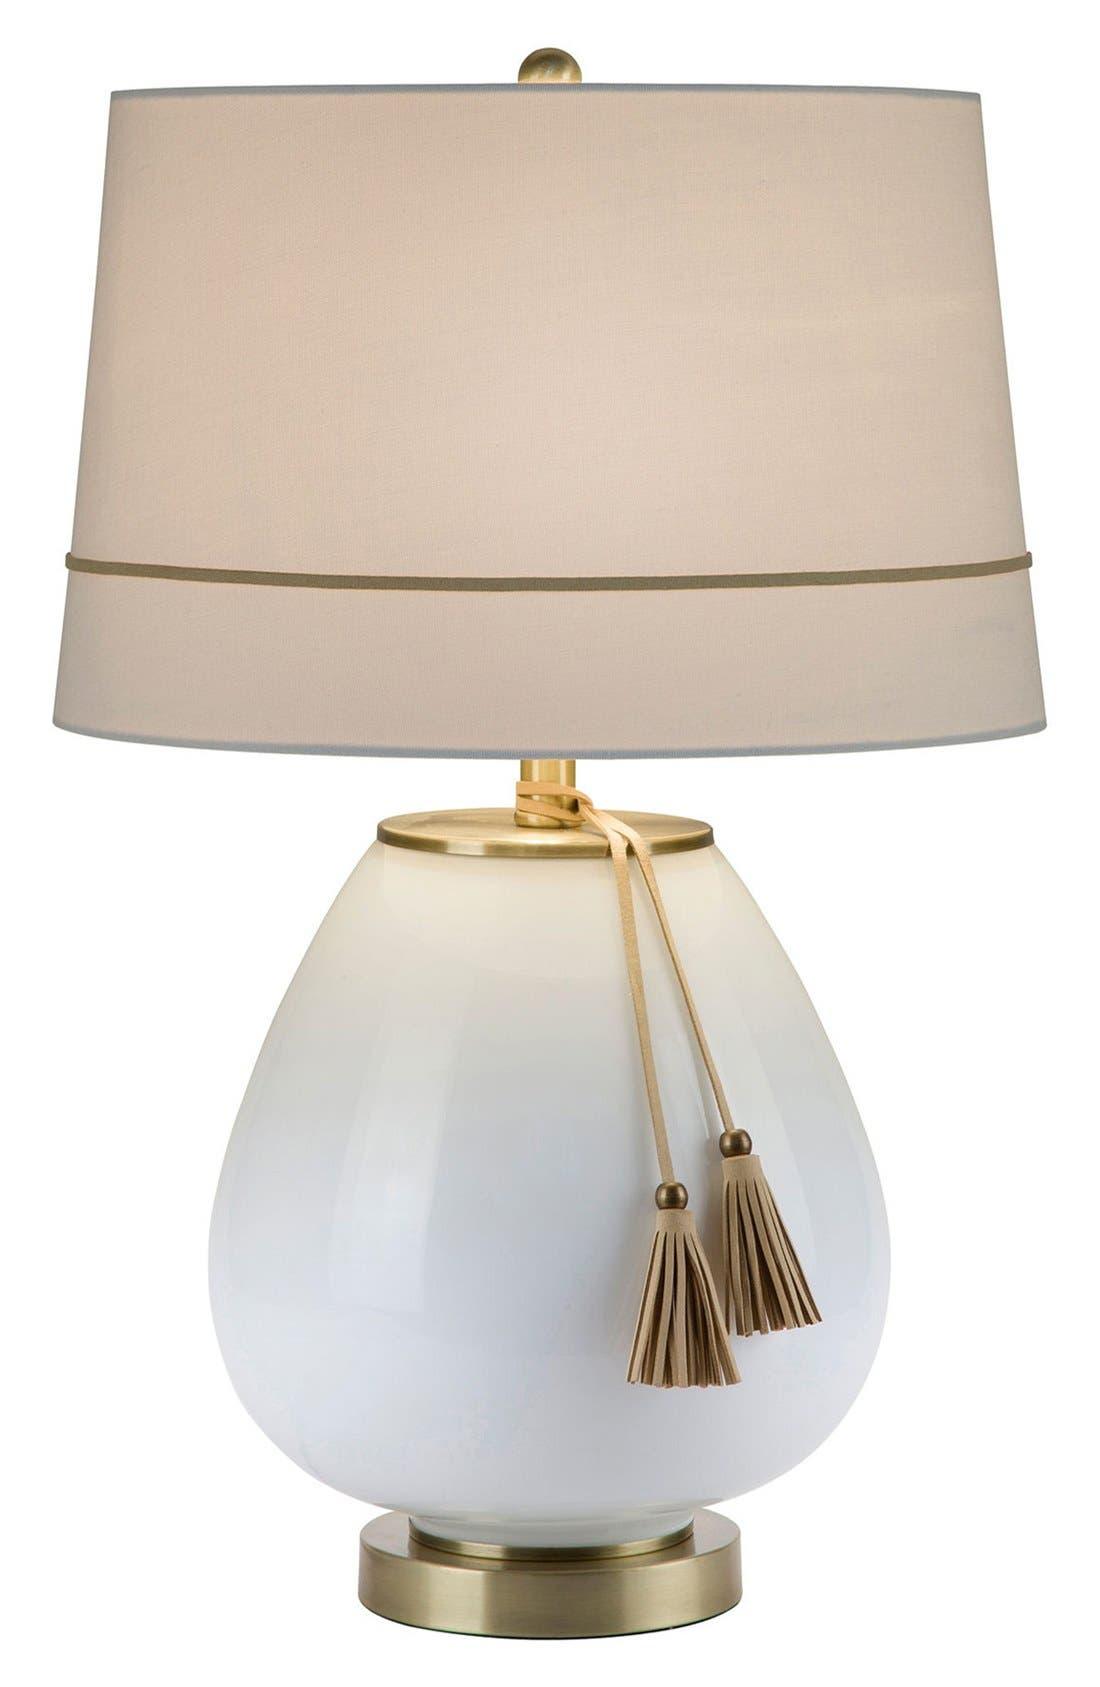 lighting, lamps & fans | nordstrom | nordstrom